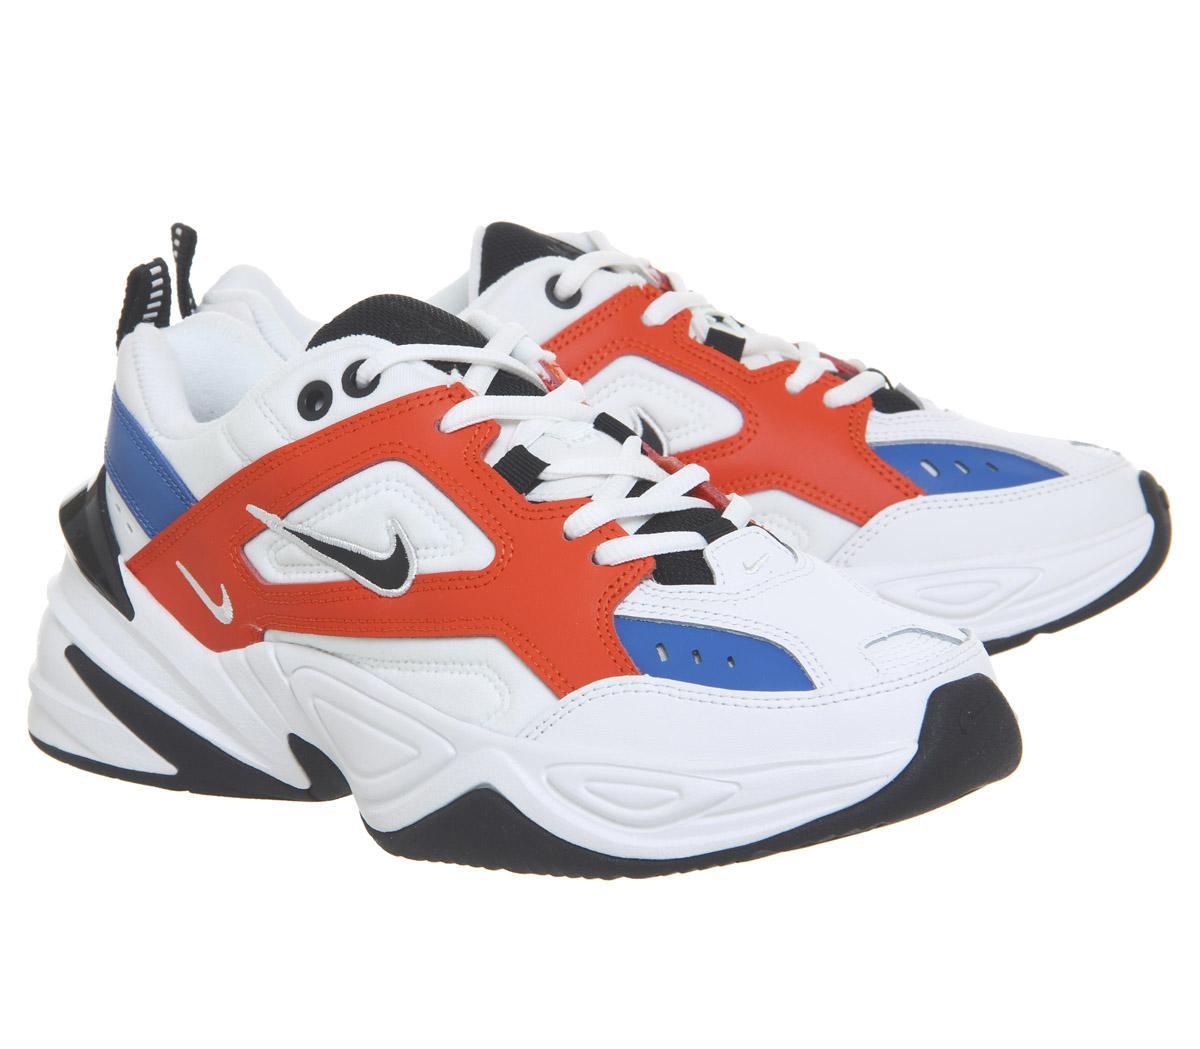 Nike Multicolor M2k Tekno Trainers for men